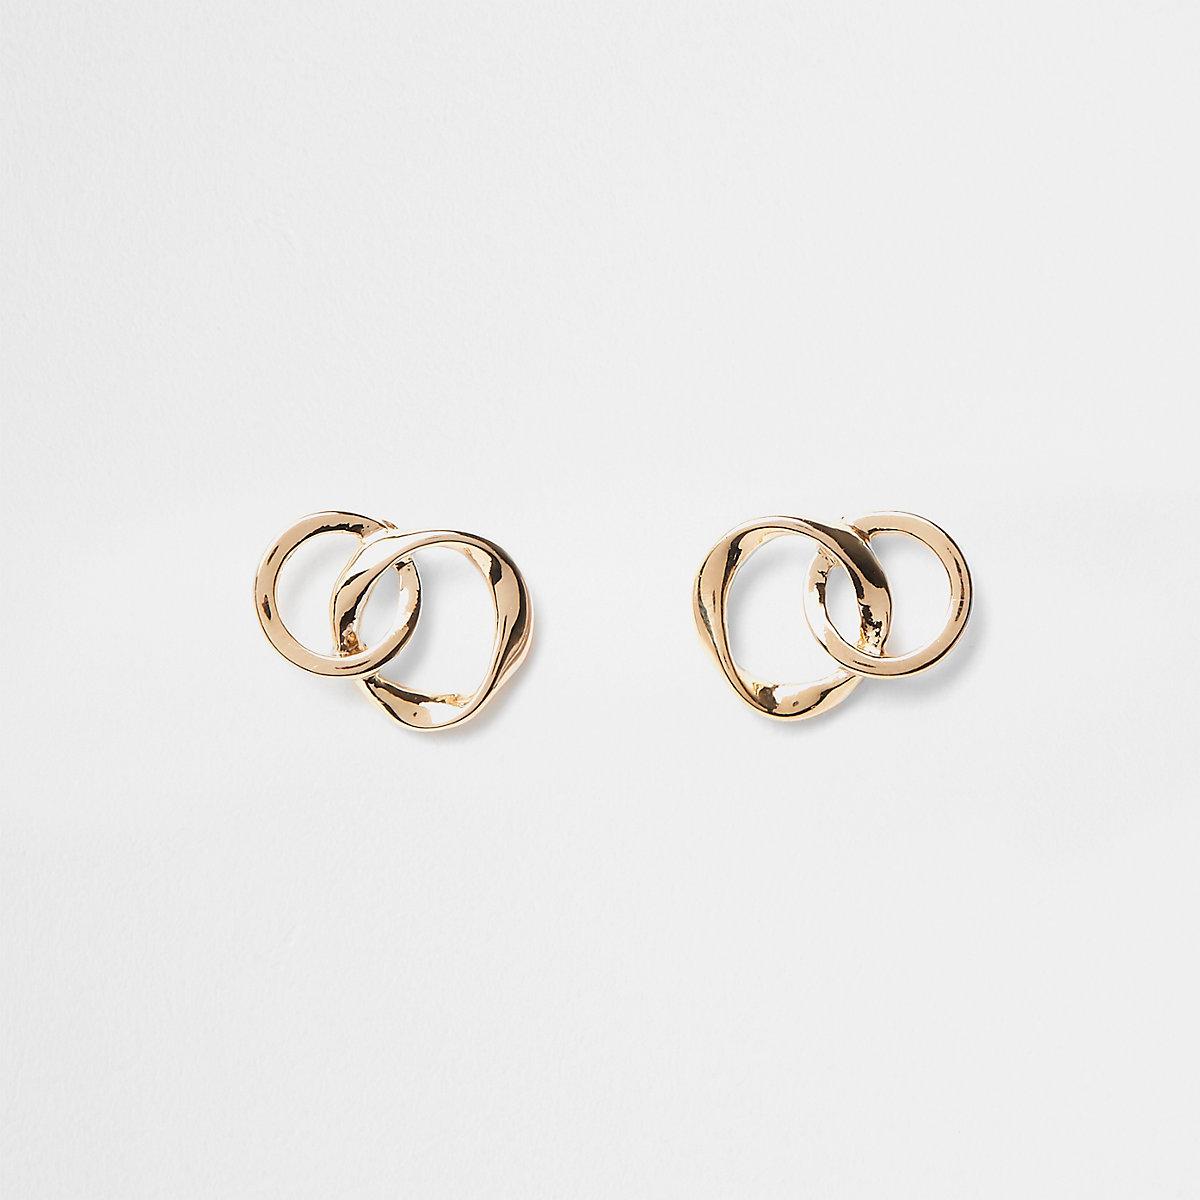 Gold plated wavy interlinked stud earrings